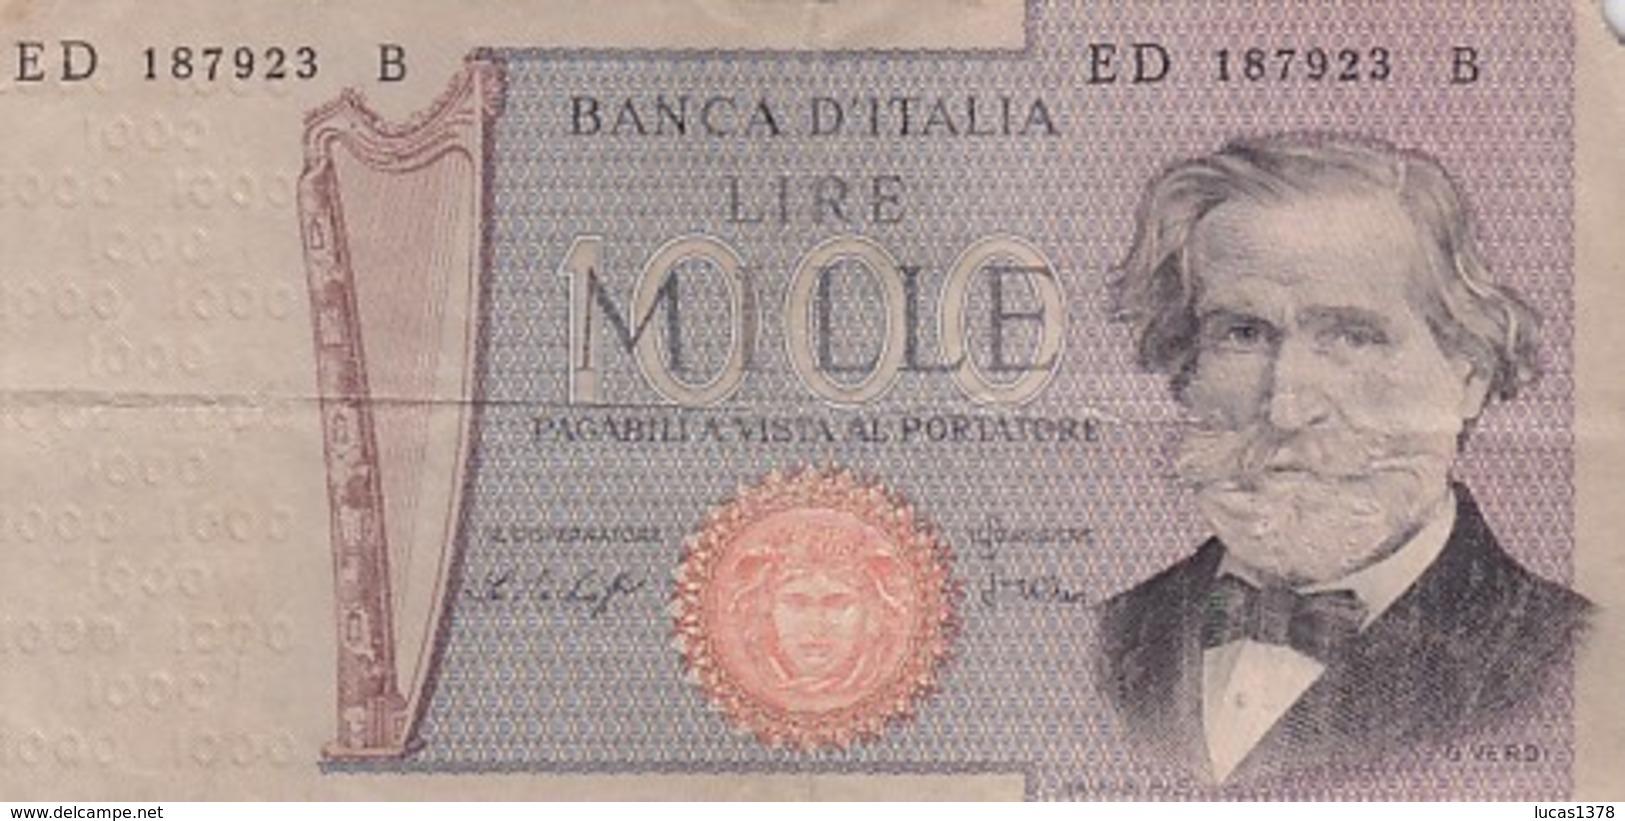 ITALIE 1000 LIRE VERDI 1969 / - 1000 Lire